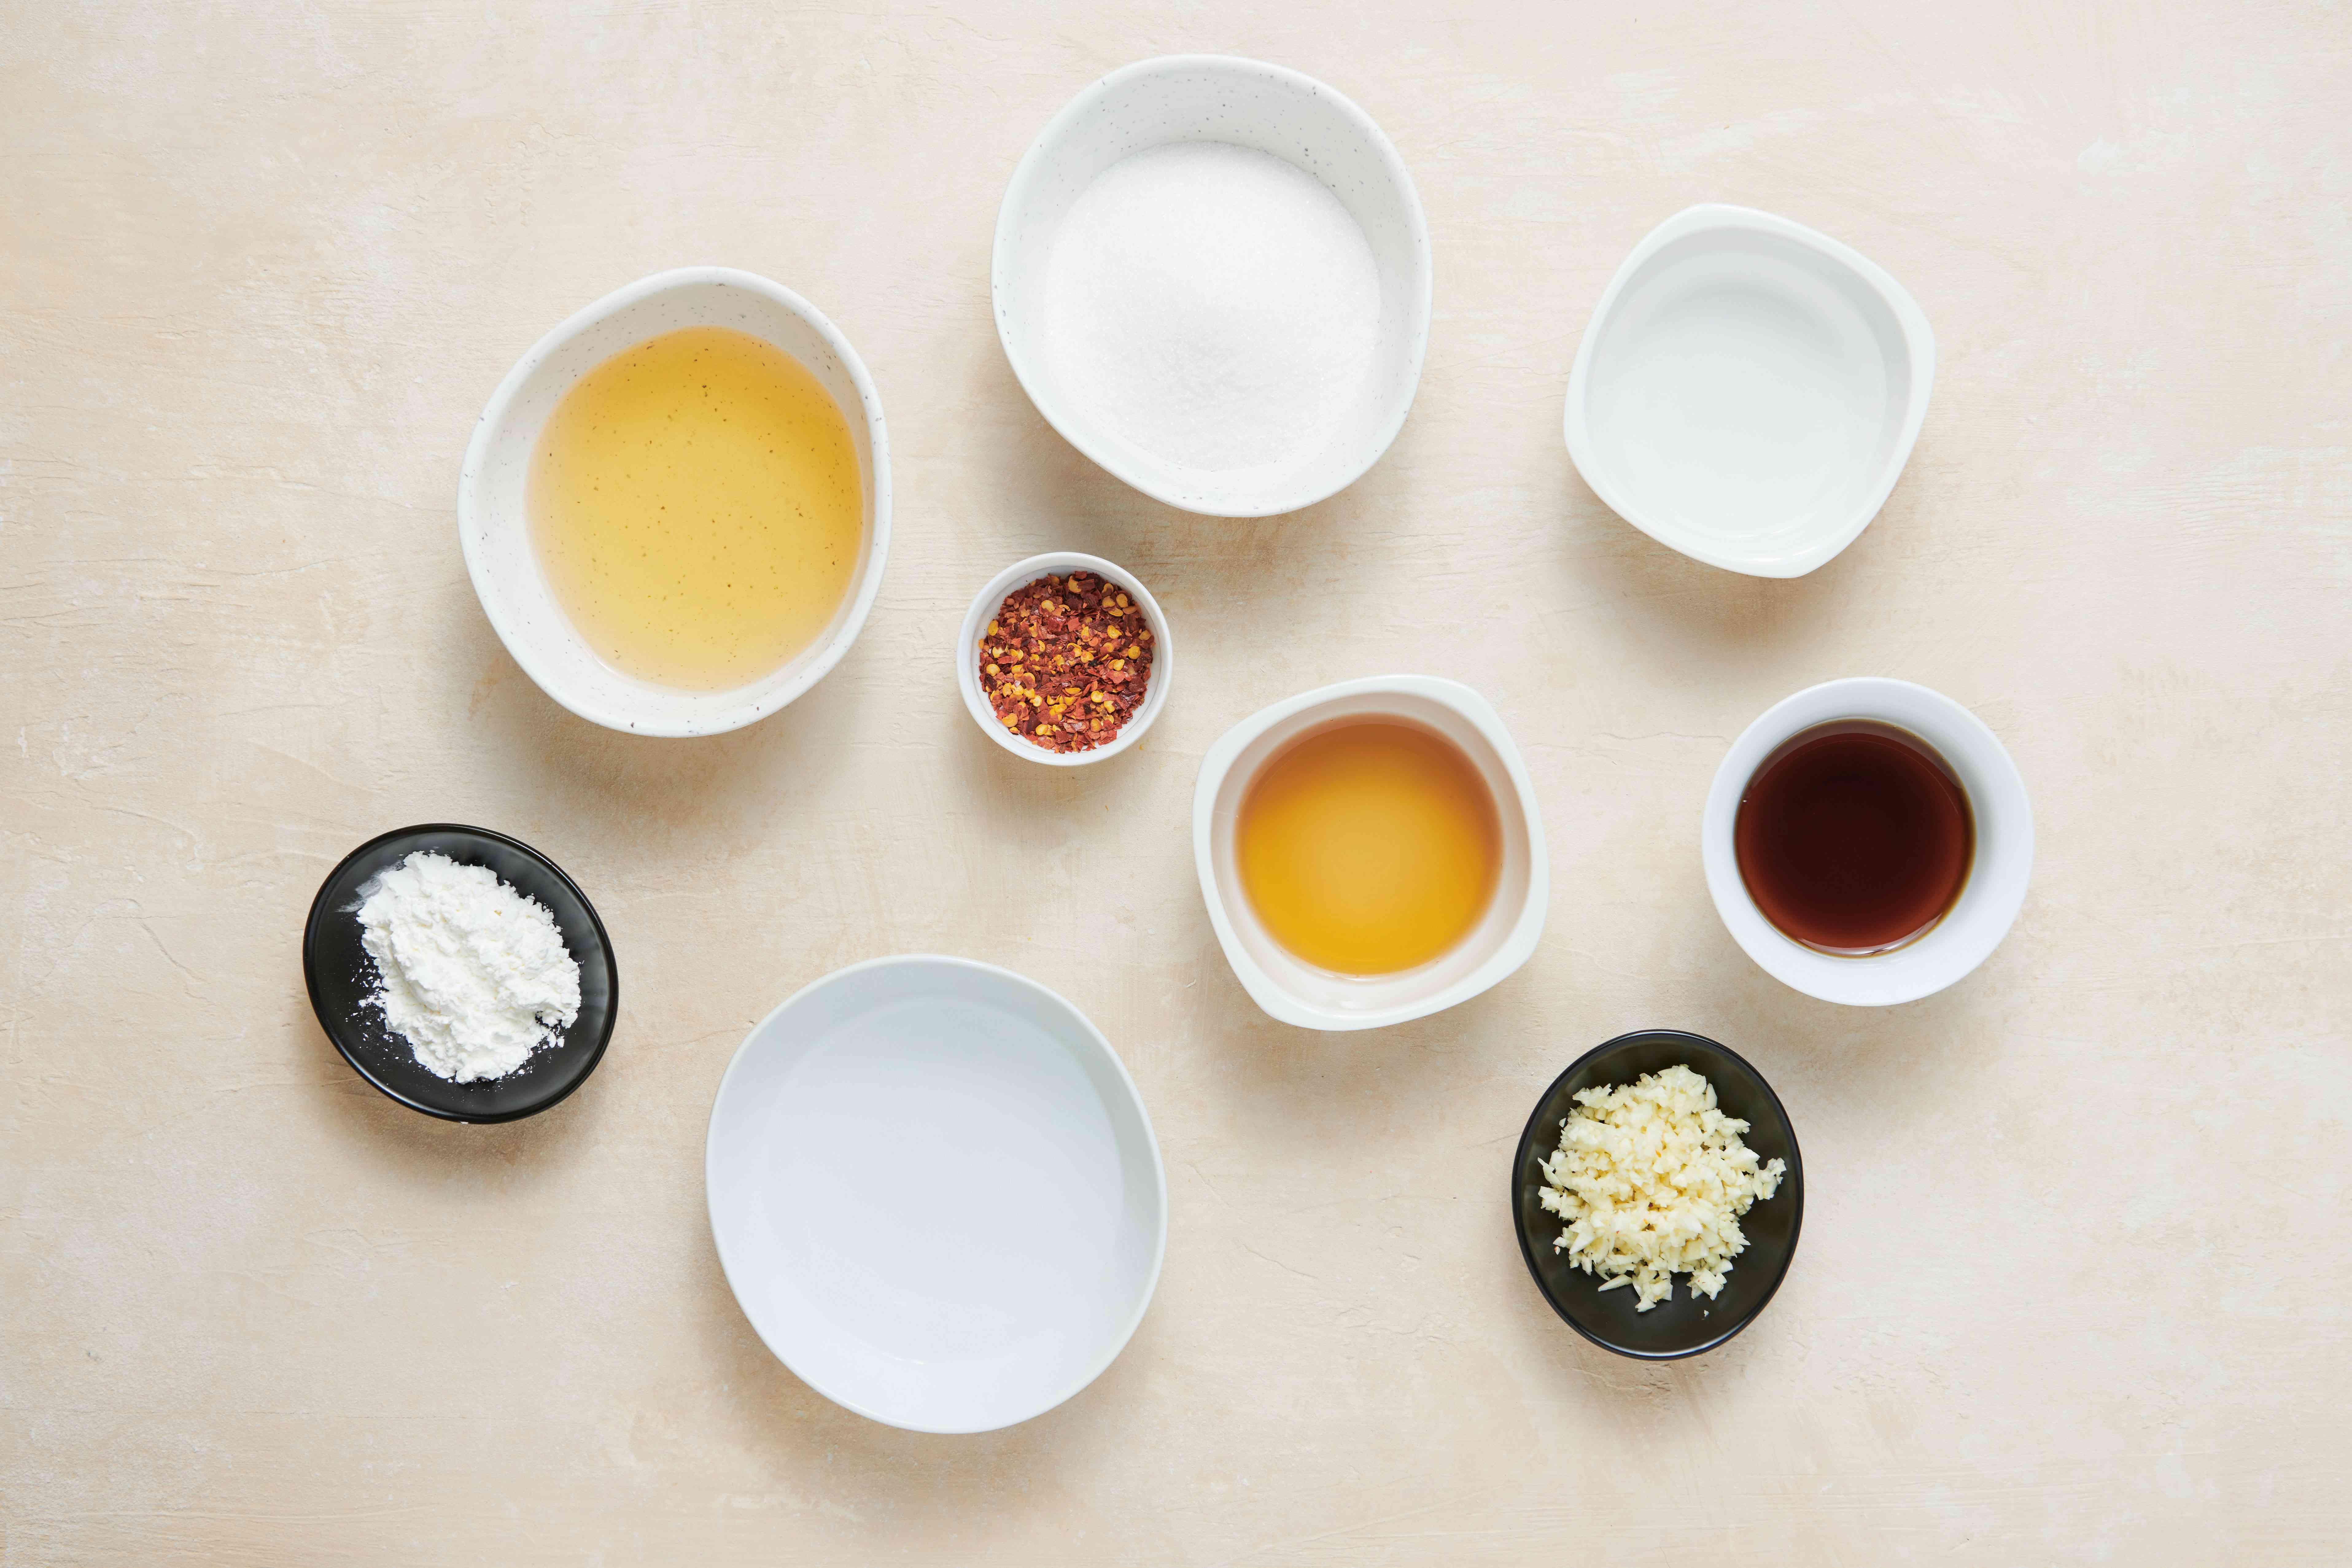 Ingredients for making Thai sweet chili sauce